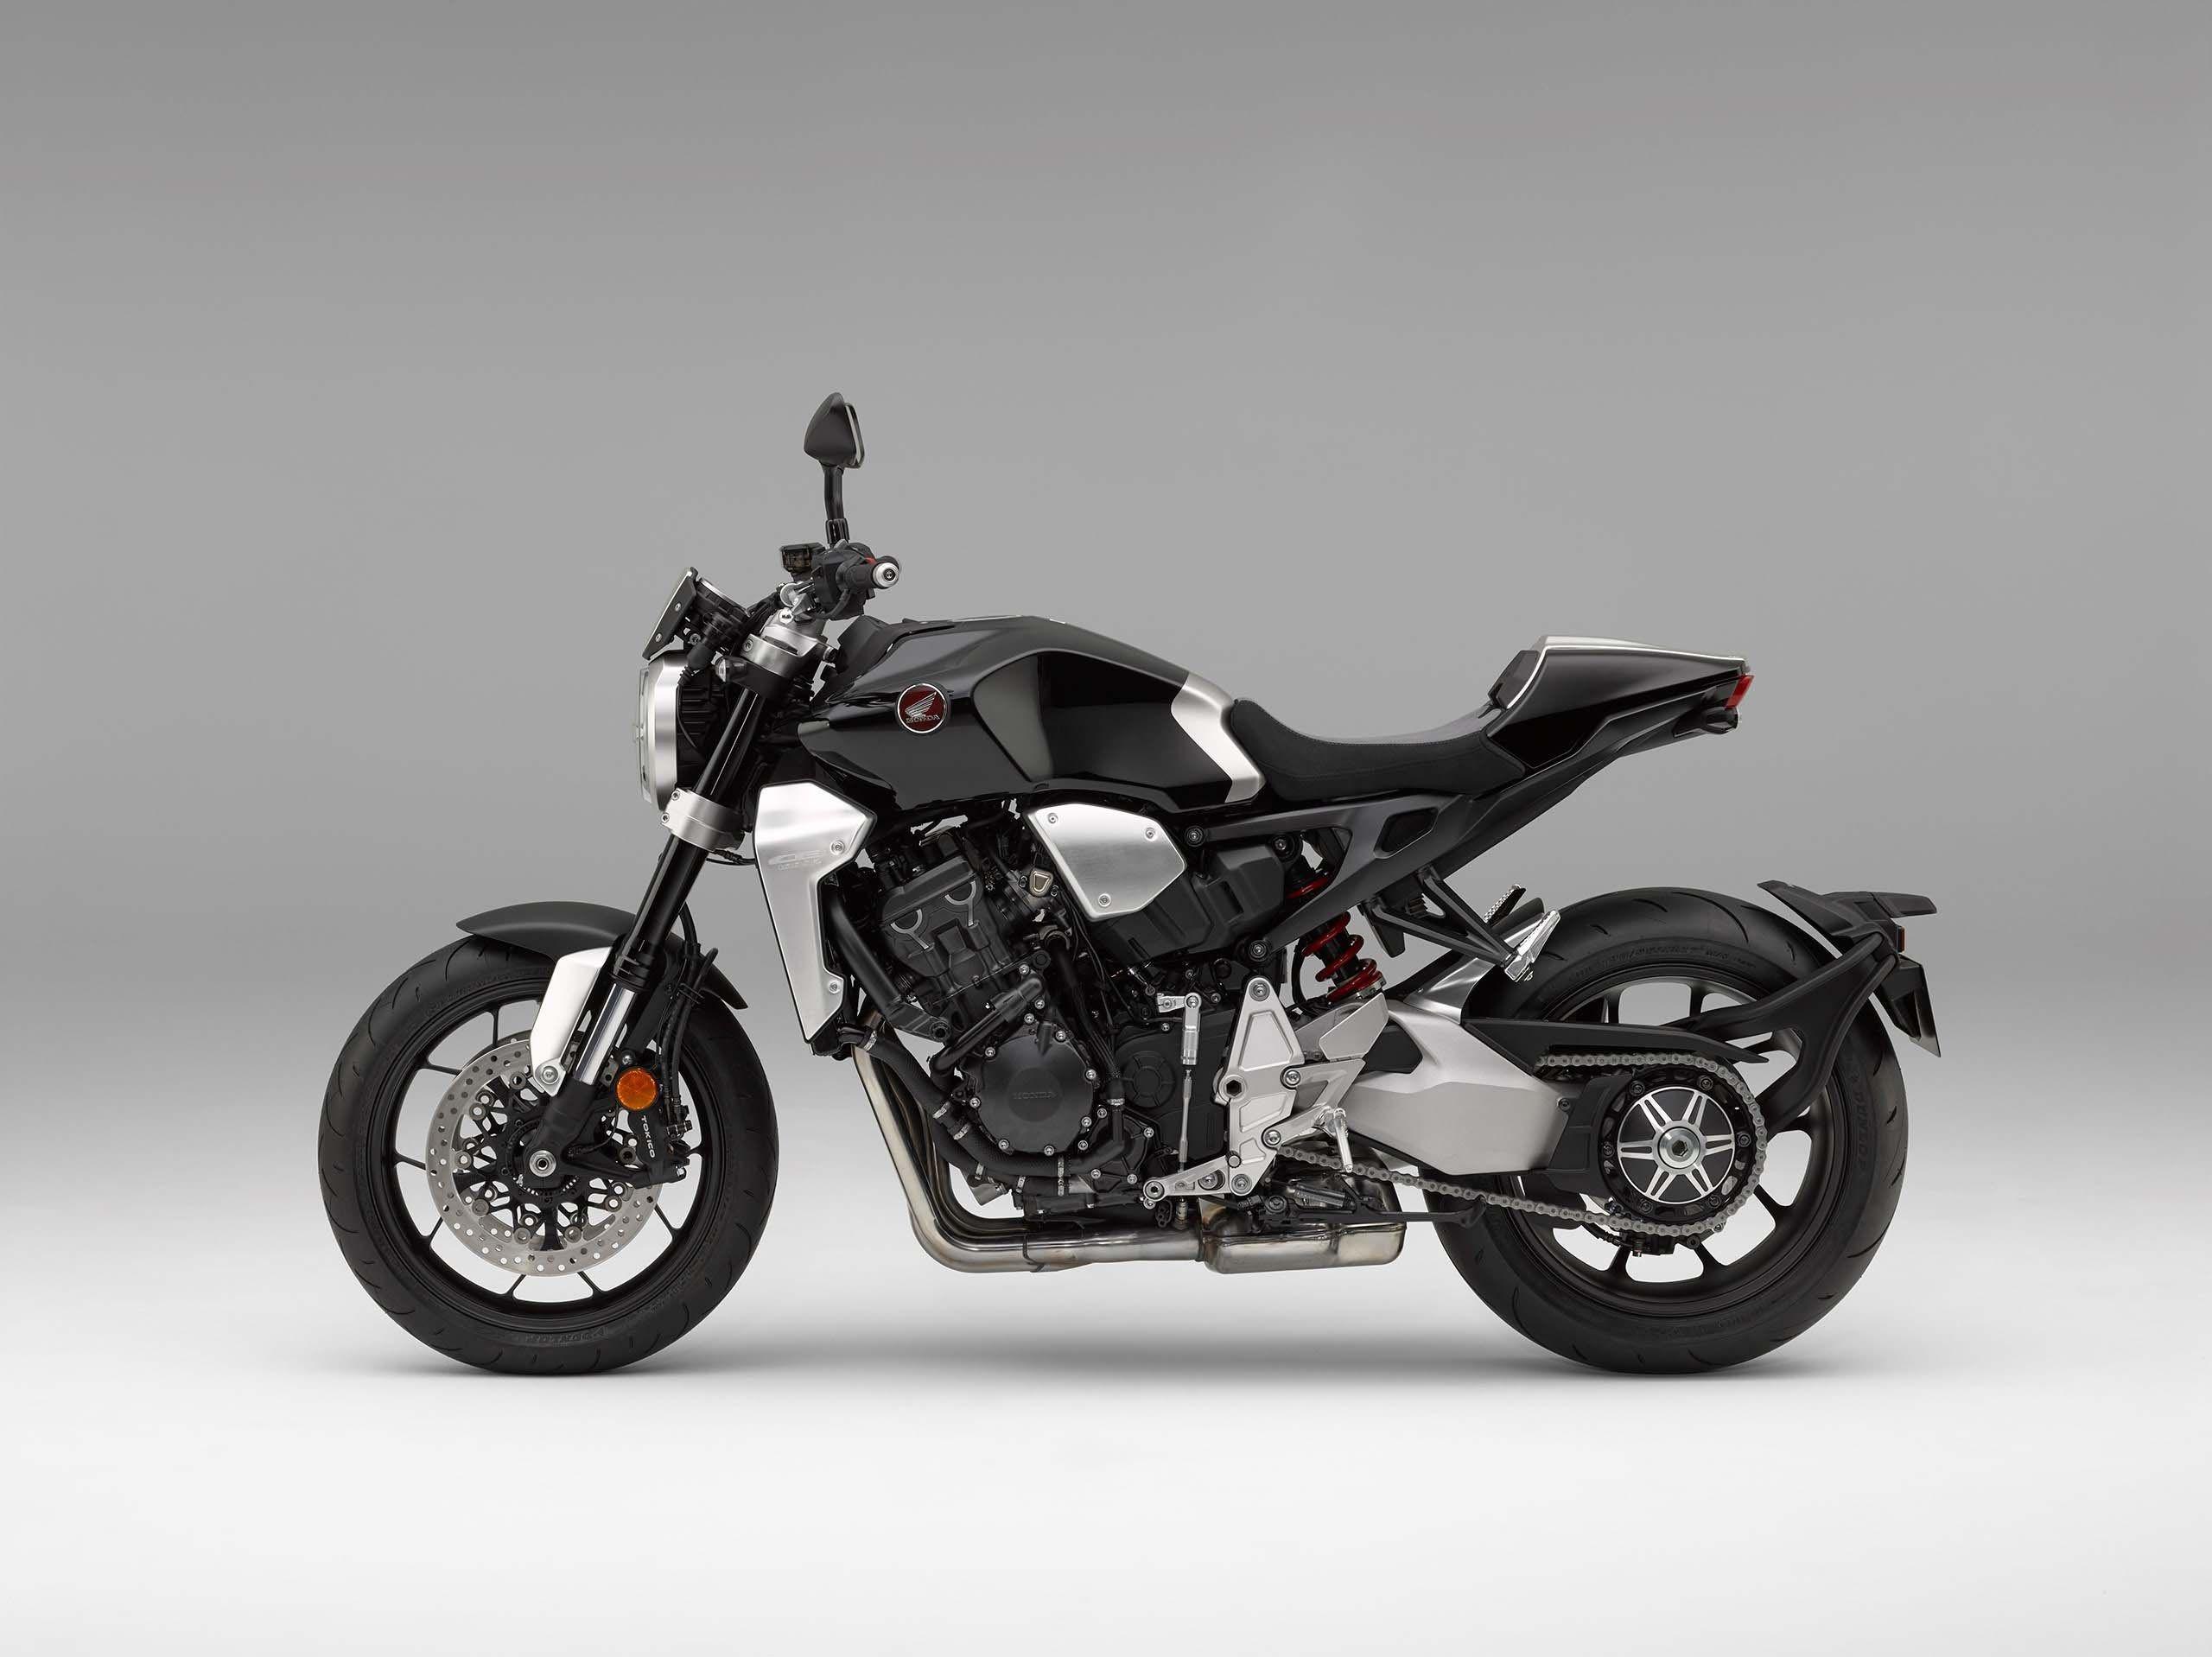 New Honda Cb1000r 2018 Honda Cb Futuristic Motorcycle Retro Motorcycle